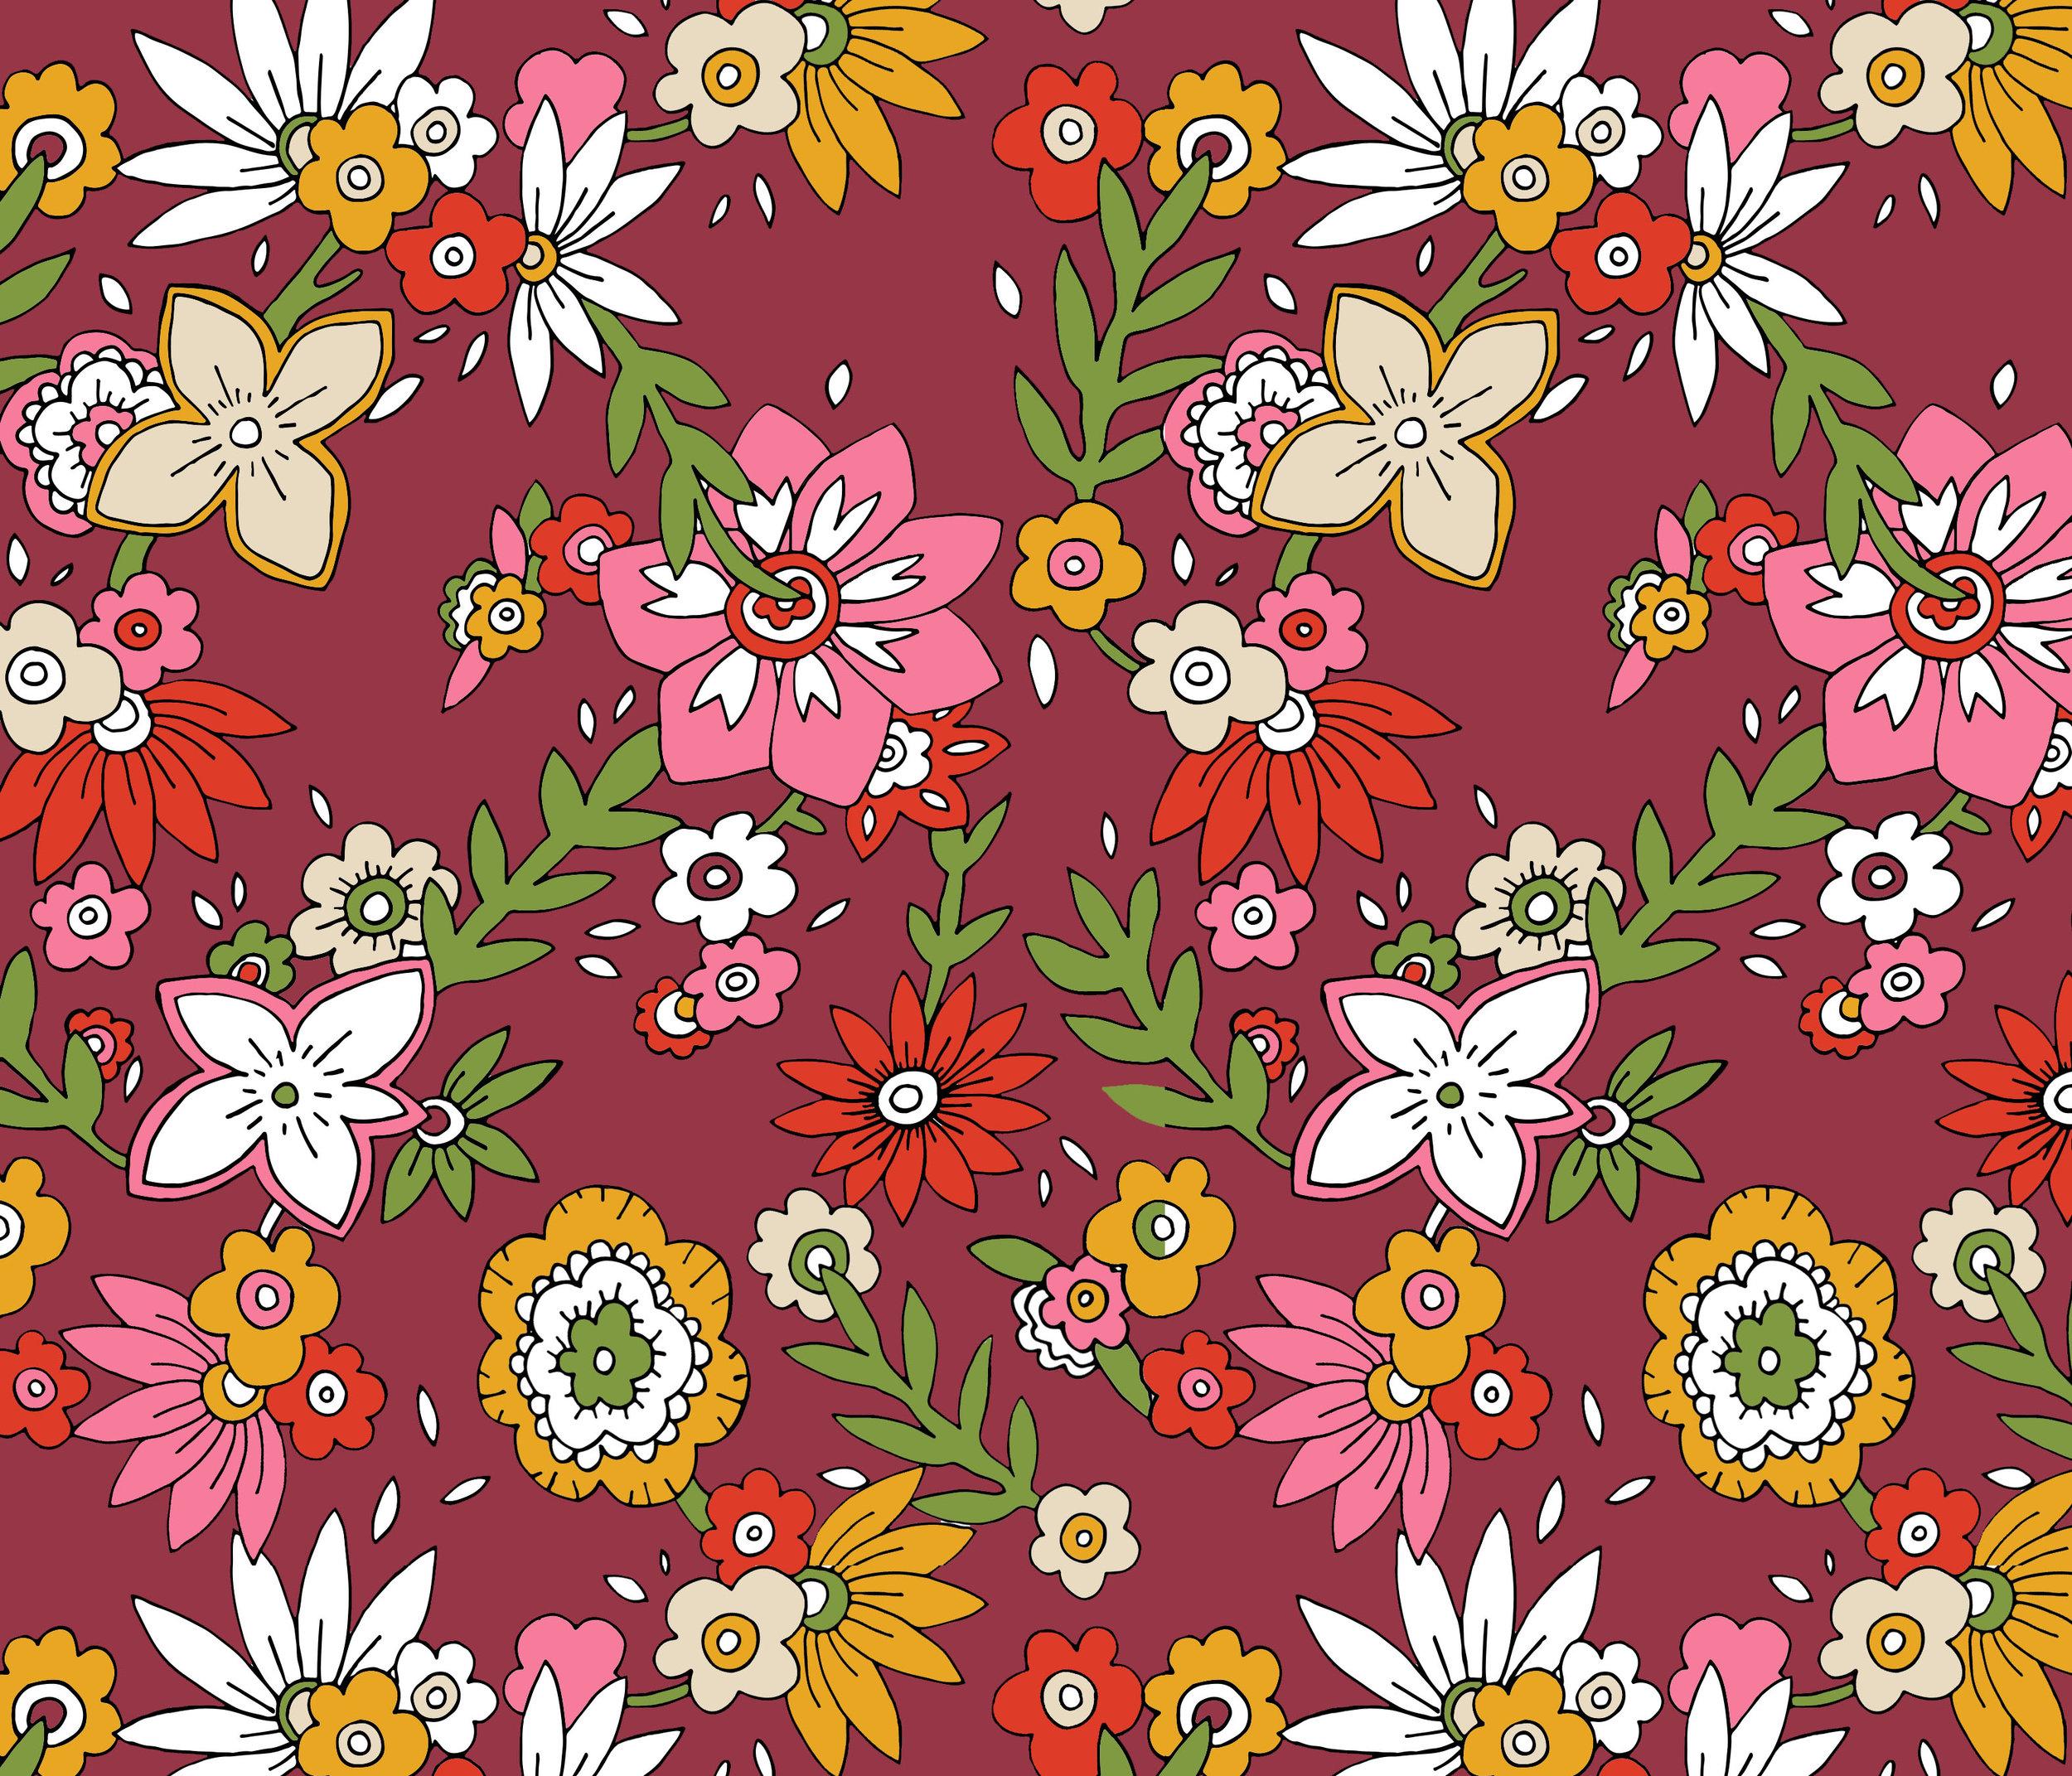 floral60s.jpg